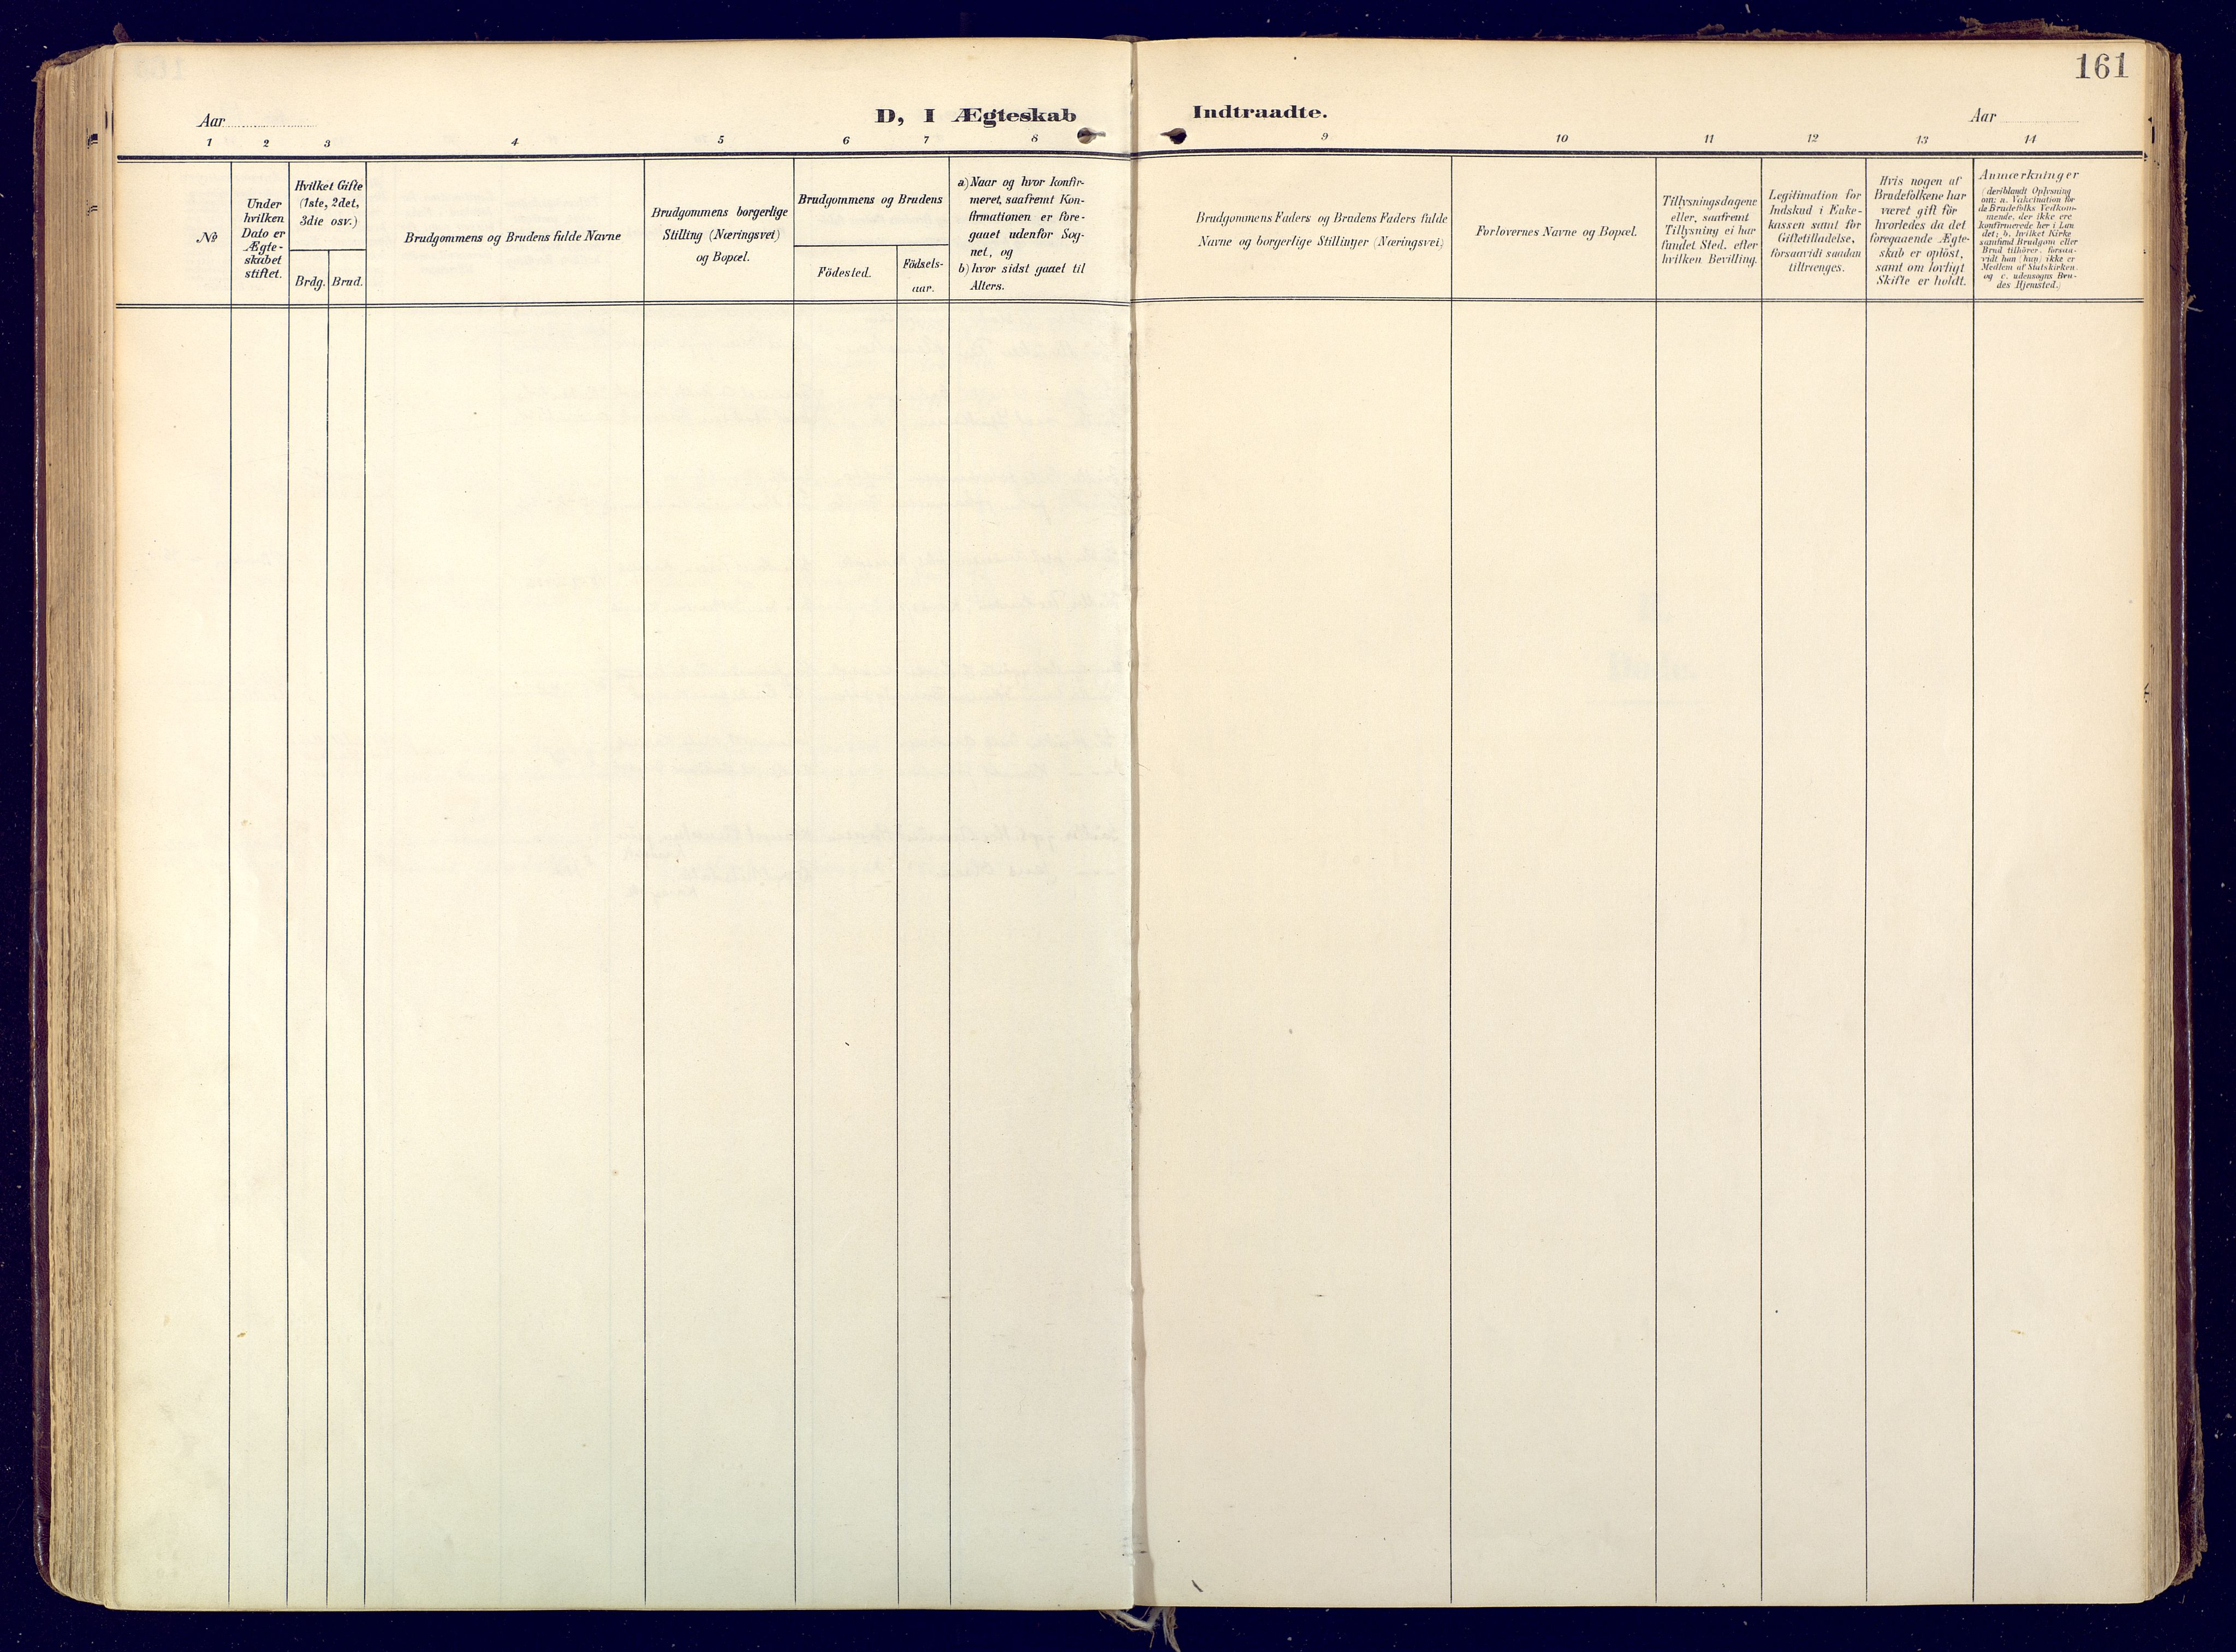 SATØ, Karasjok sokneprestkontor, H/Ha: Ministerialbok nr. 3, 1907-1926, s. 161